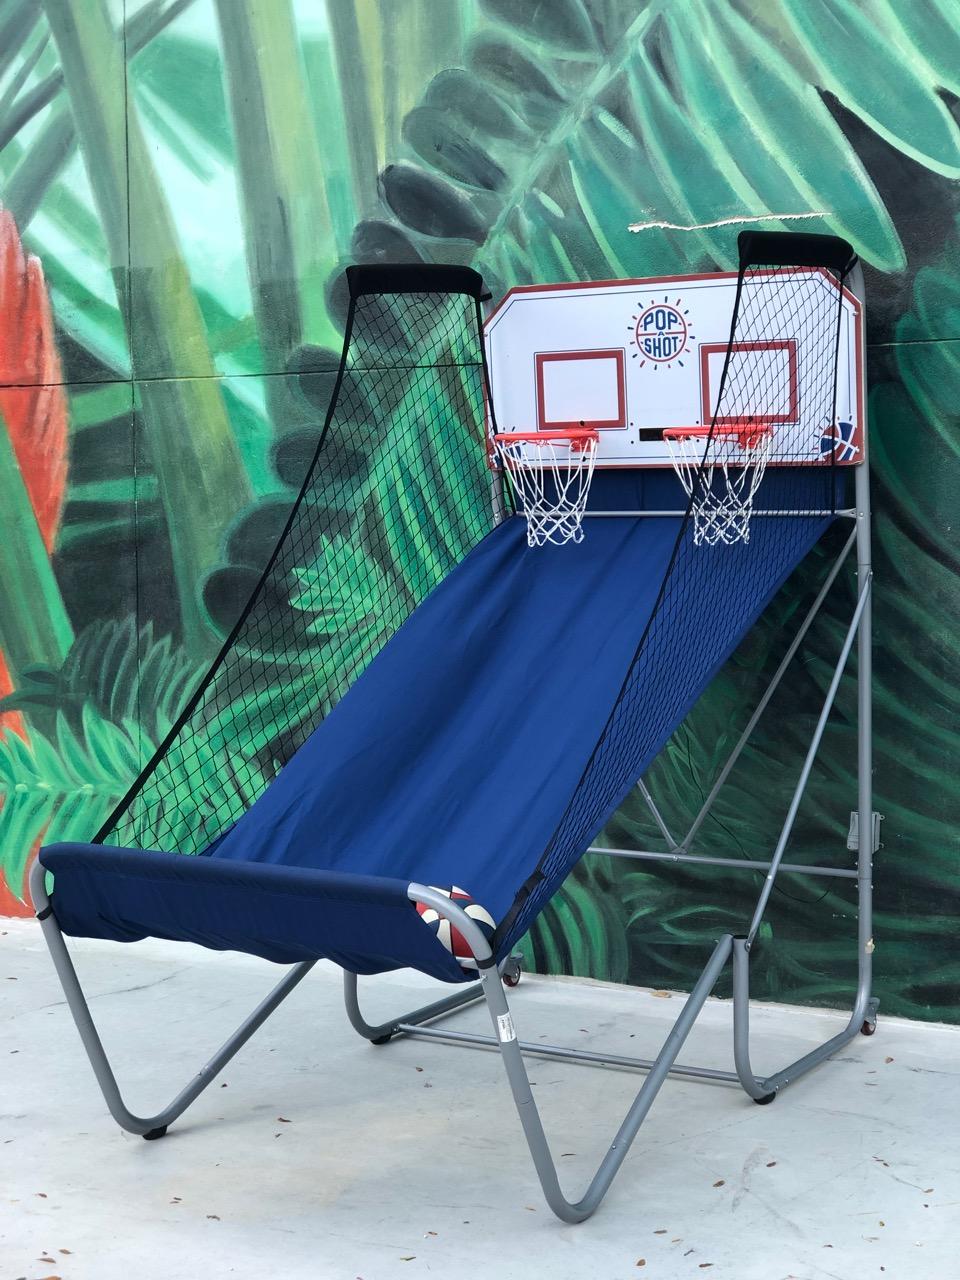 2 Player Basketball Arcade Rental Florid